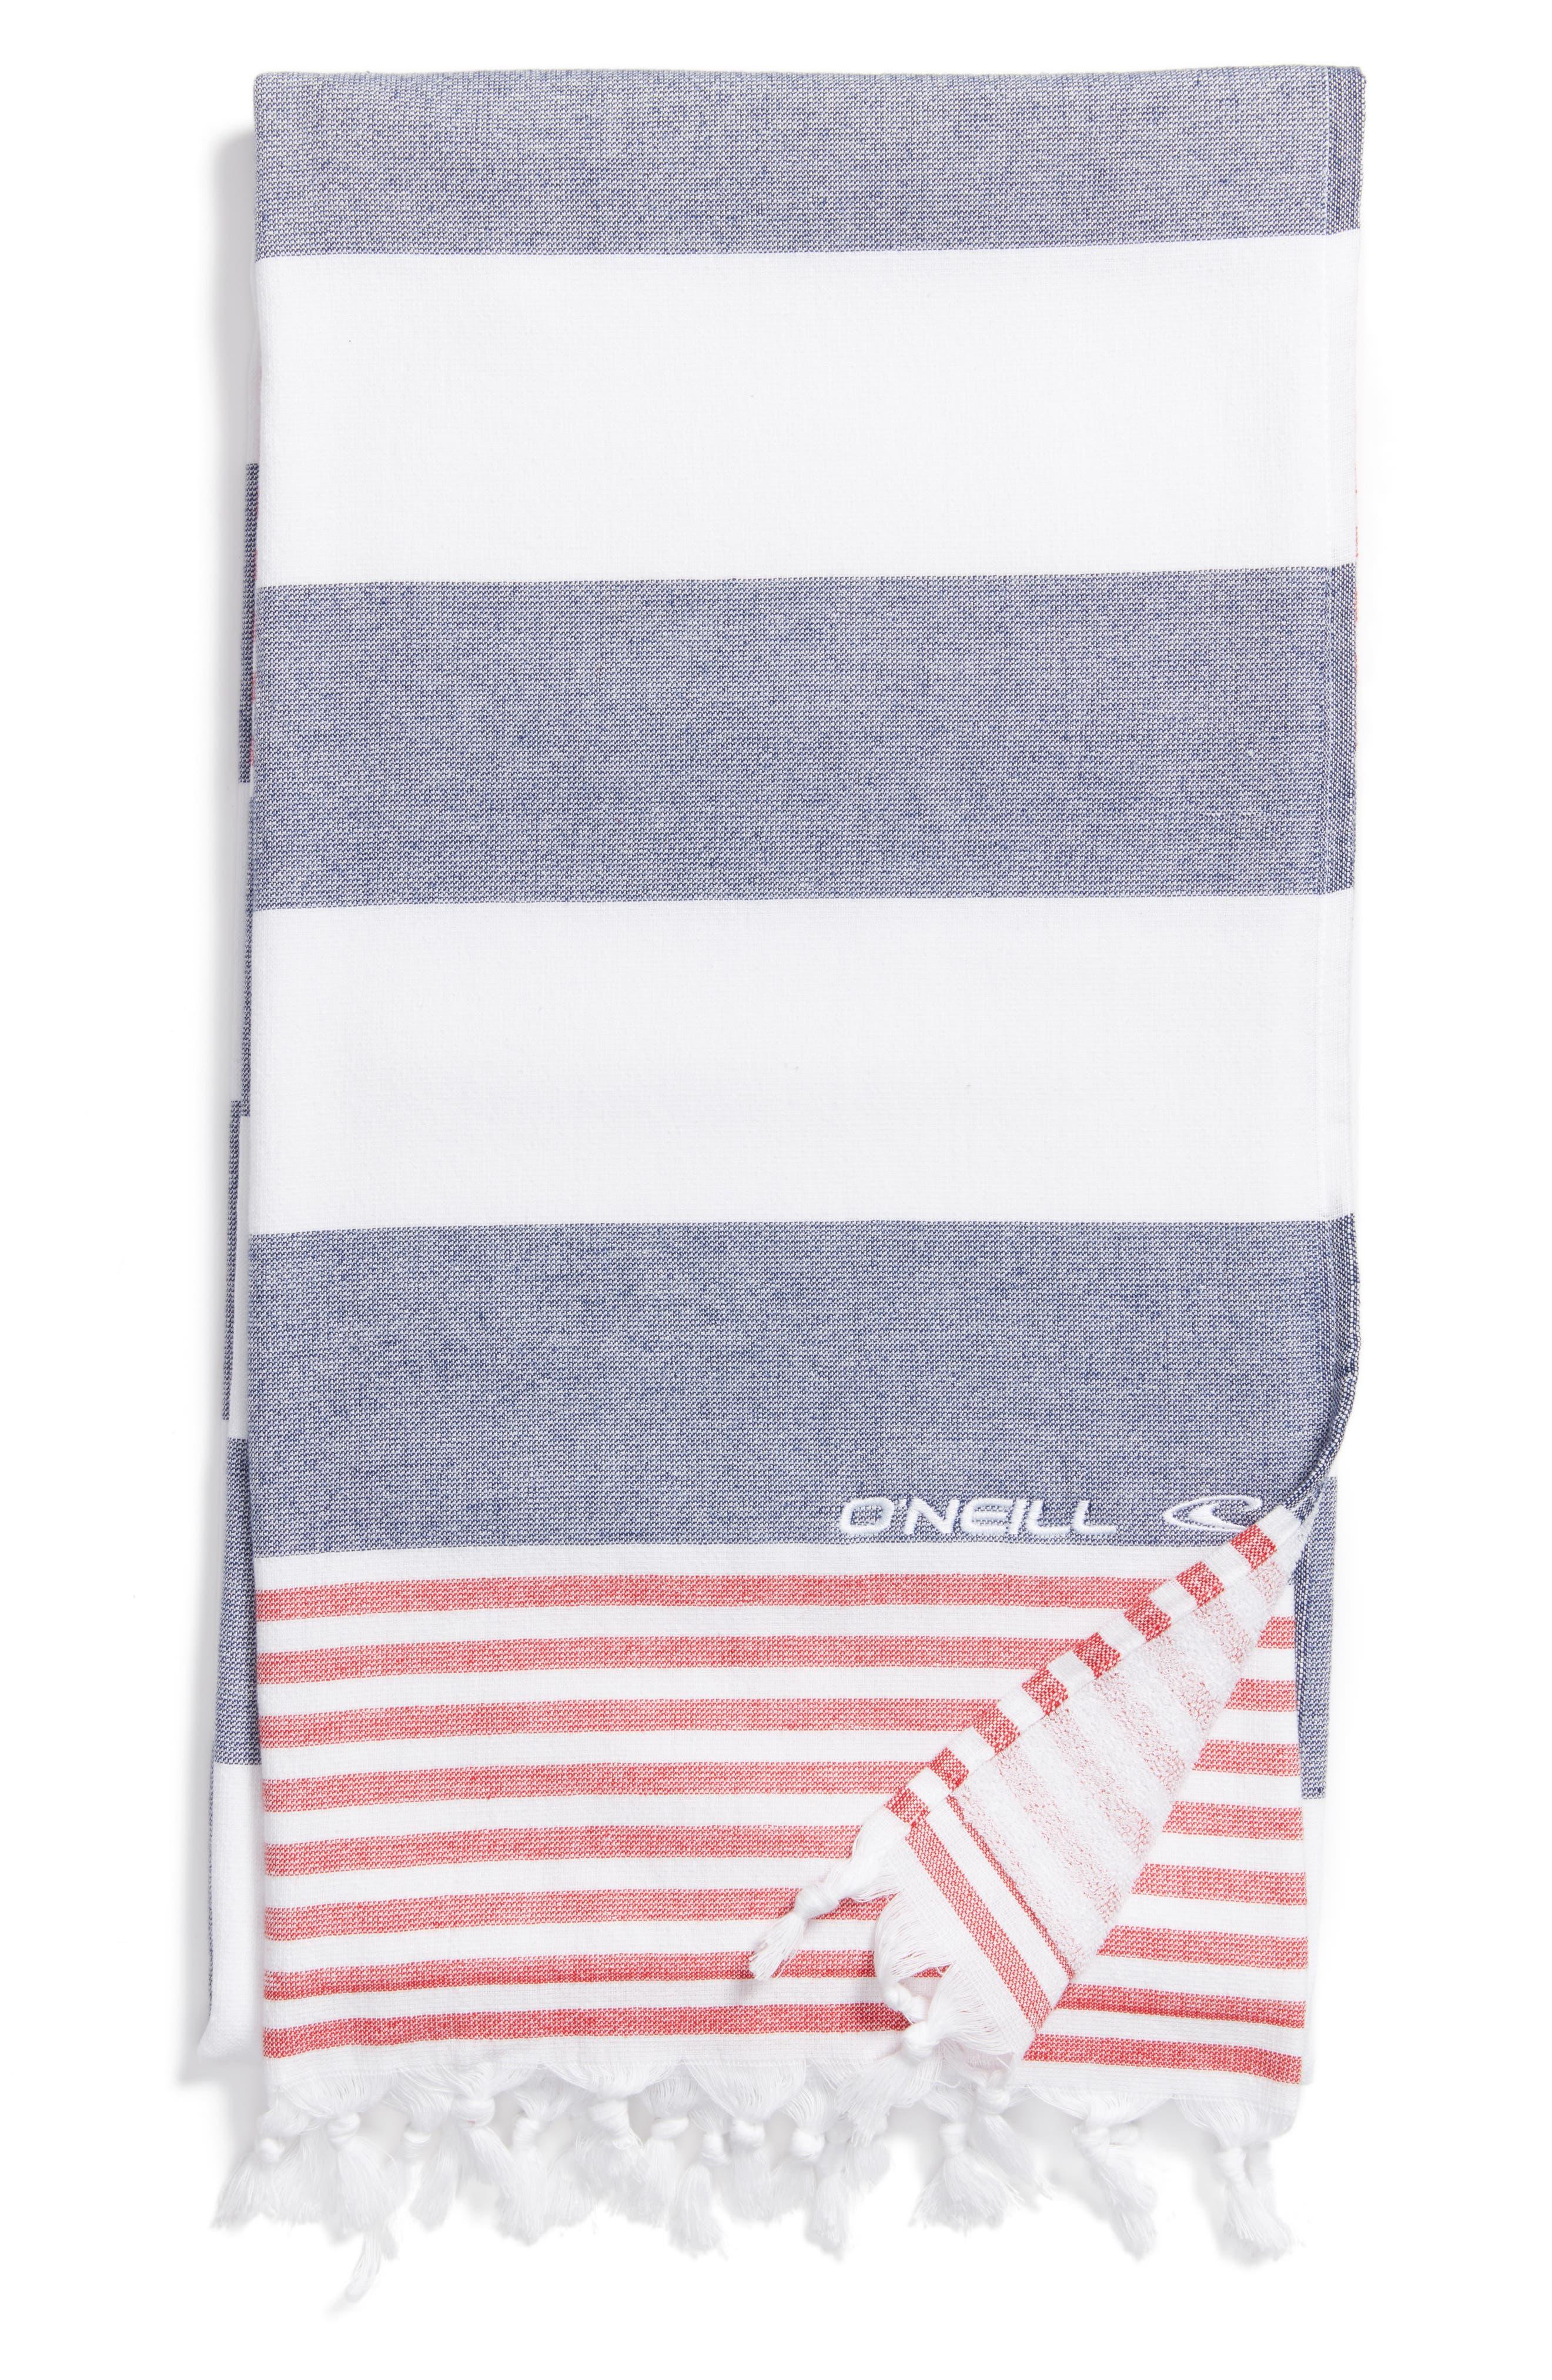 O'Neill Caribbean Towel